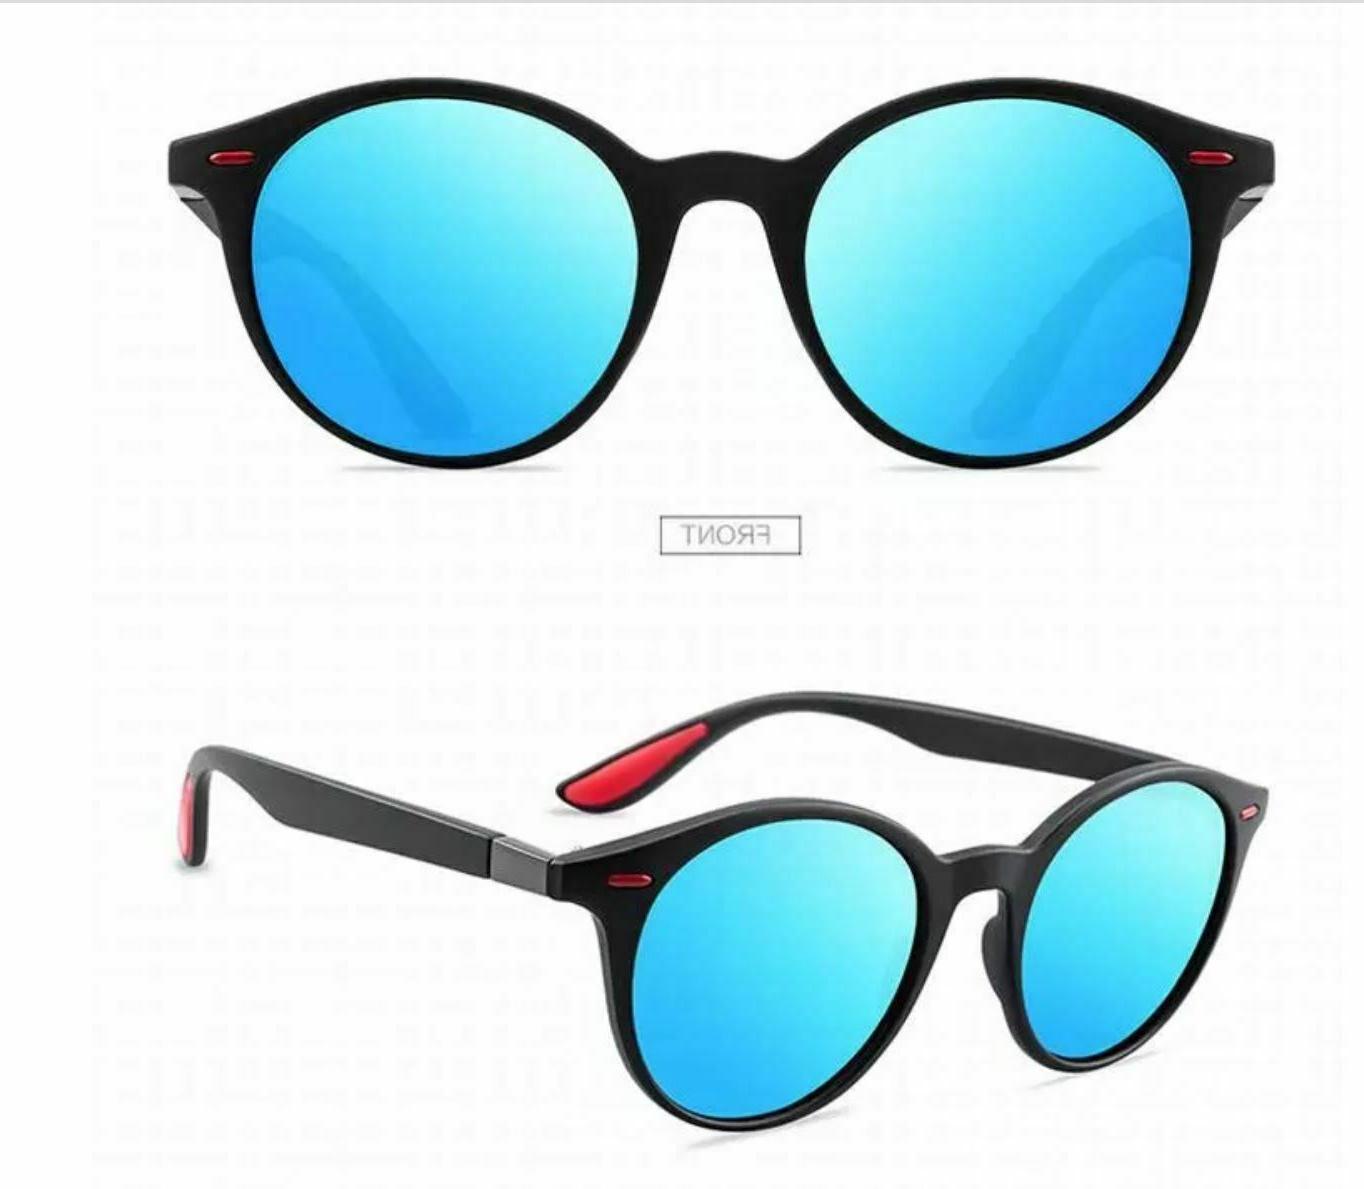 Men's Polarized Sunglasses Light Round Fashion Shades 2020